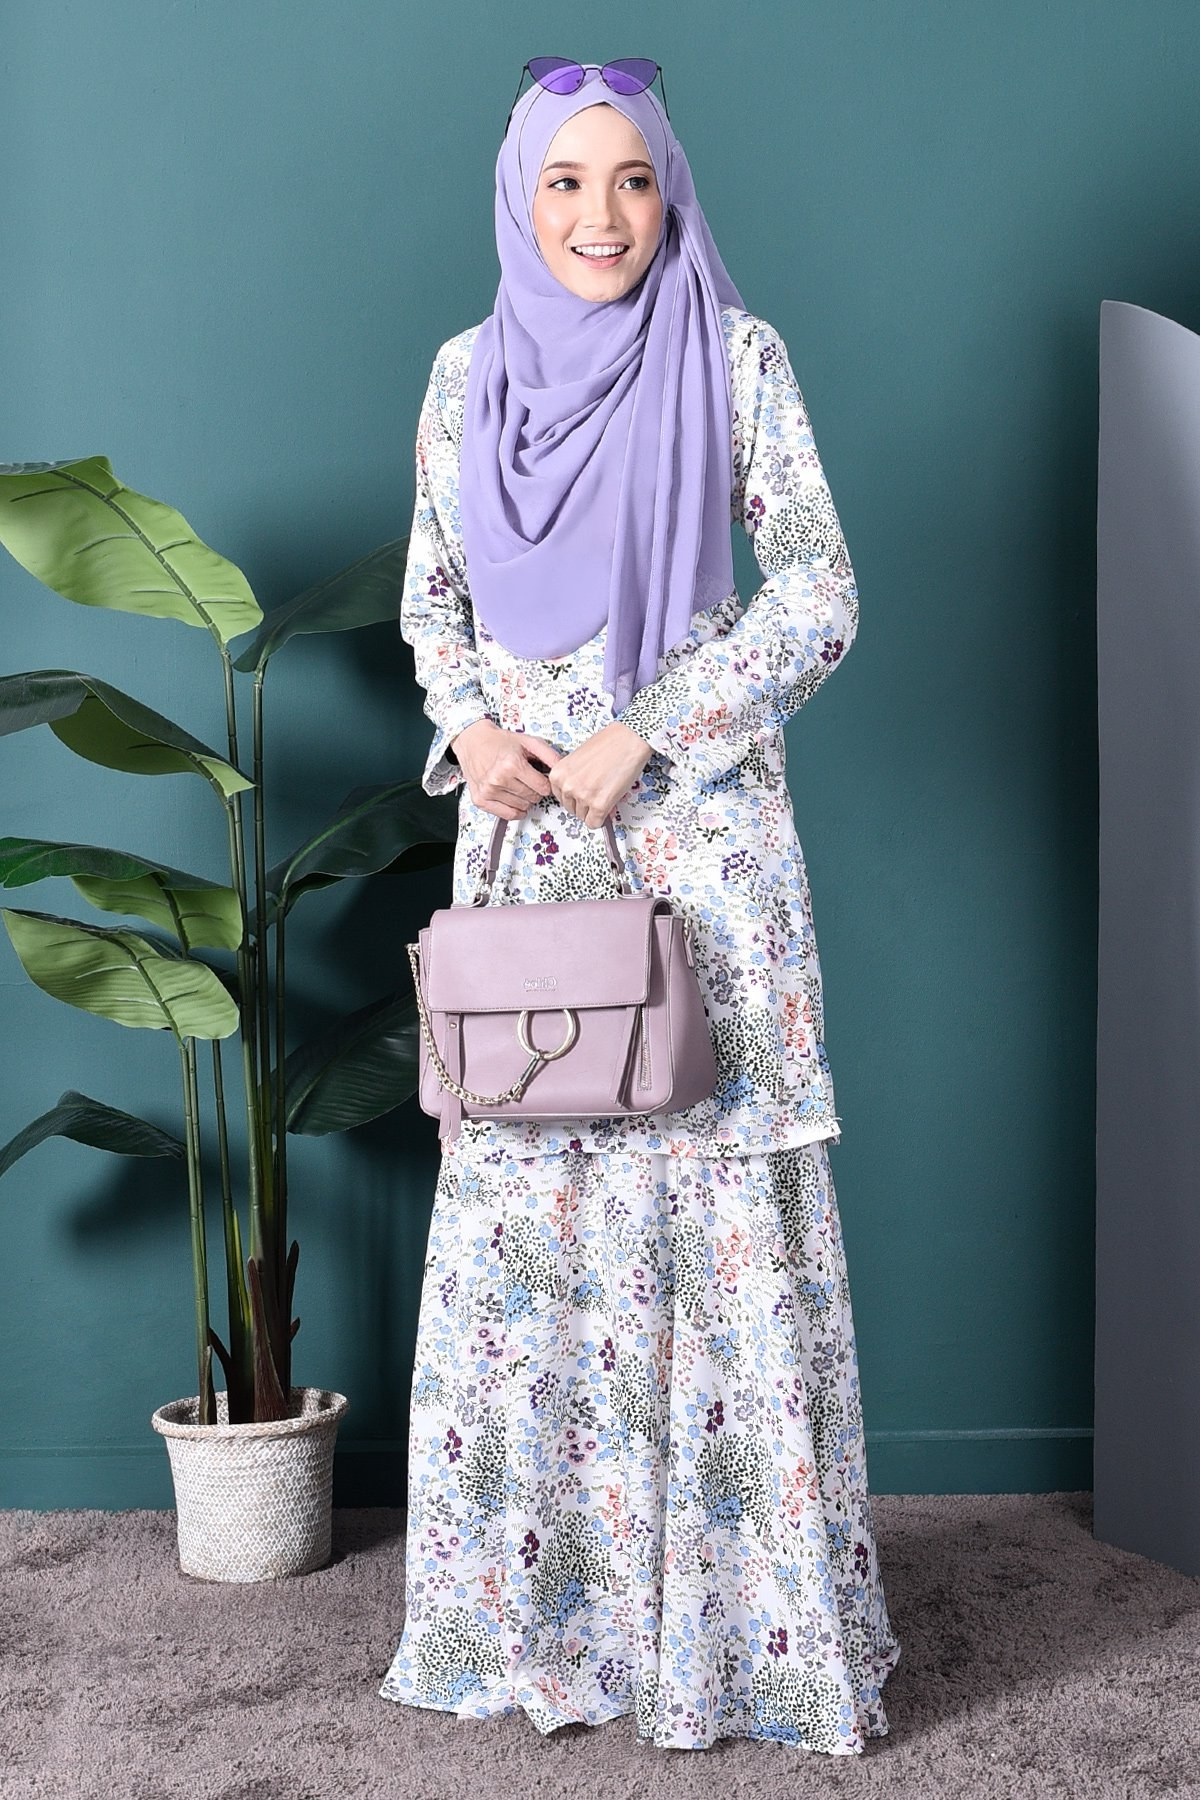 Model Model Seragam Bridesmaid Hijab 0gdr Baju Kurung Agnes – Cotton White – Muslimahclothing